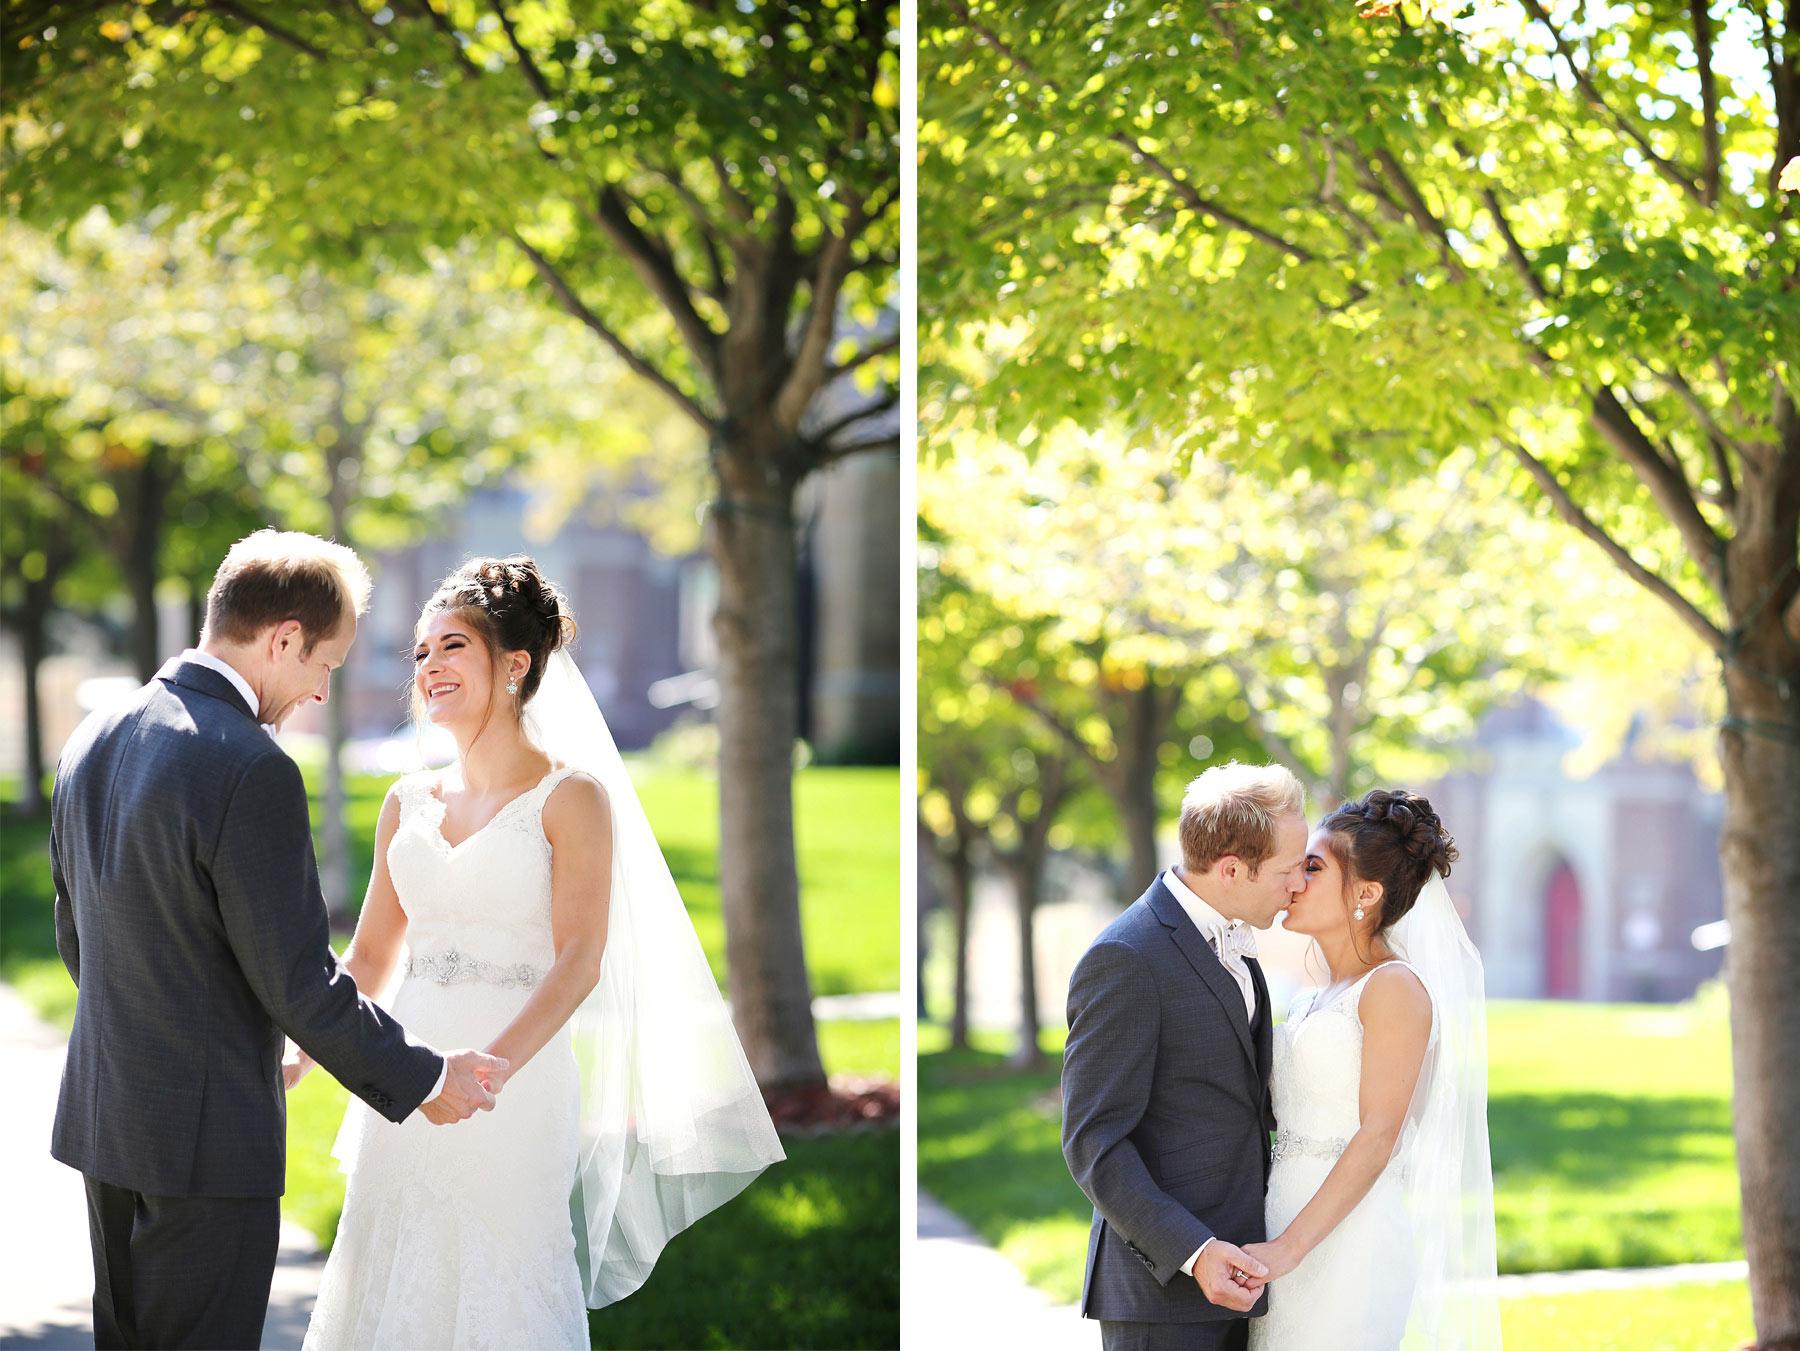 03-Saint-Louis-Park-Minnesota-Wedding-Photographer-by-Andrew-Vick-Photography-Fall-Autumn-Holy-Family-Catholic-Church-First-Meeting-Look-Bride-Groom-Kiss-Paula-and-Jason.jpg